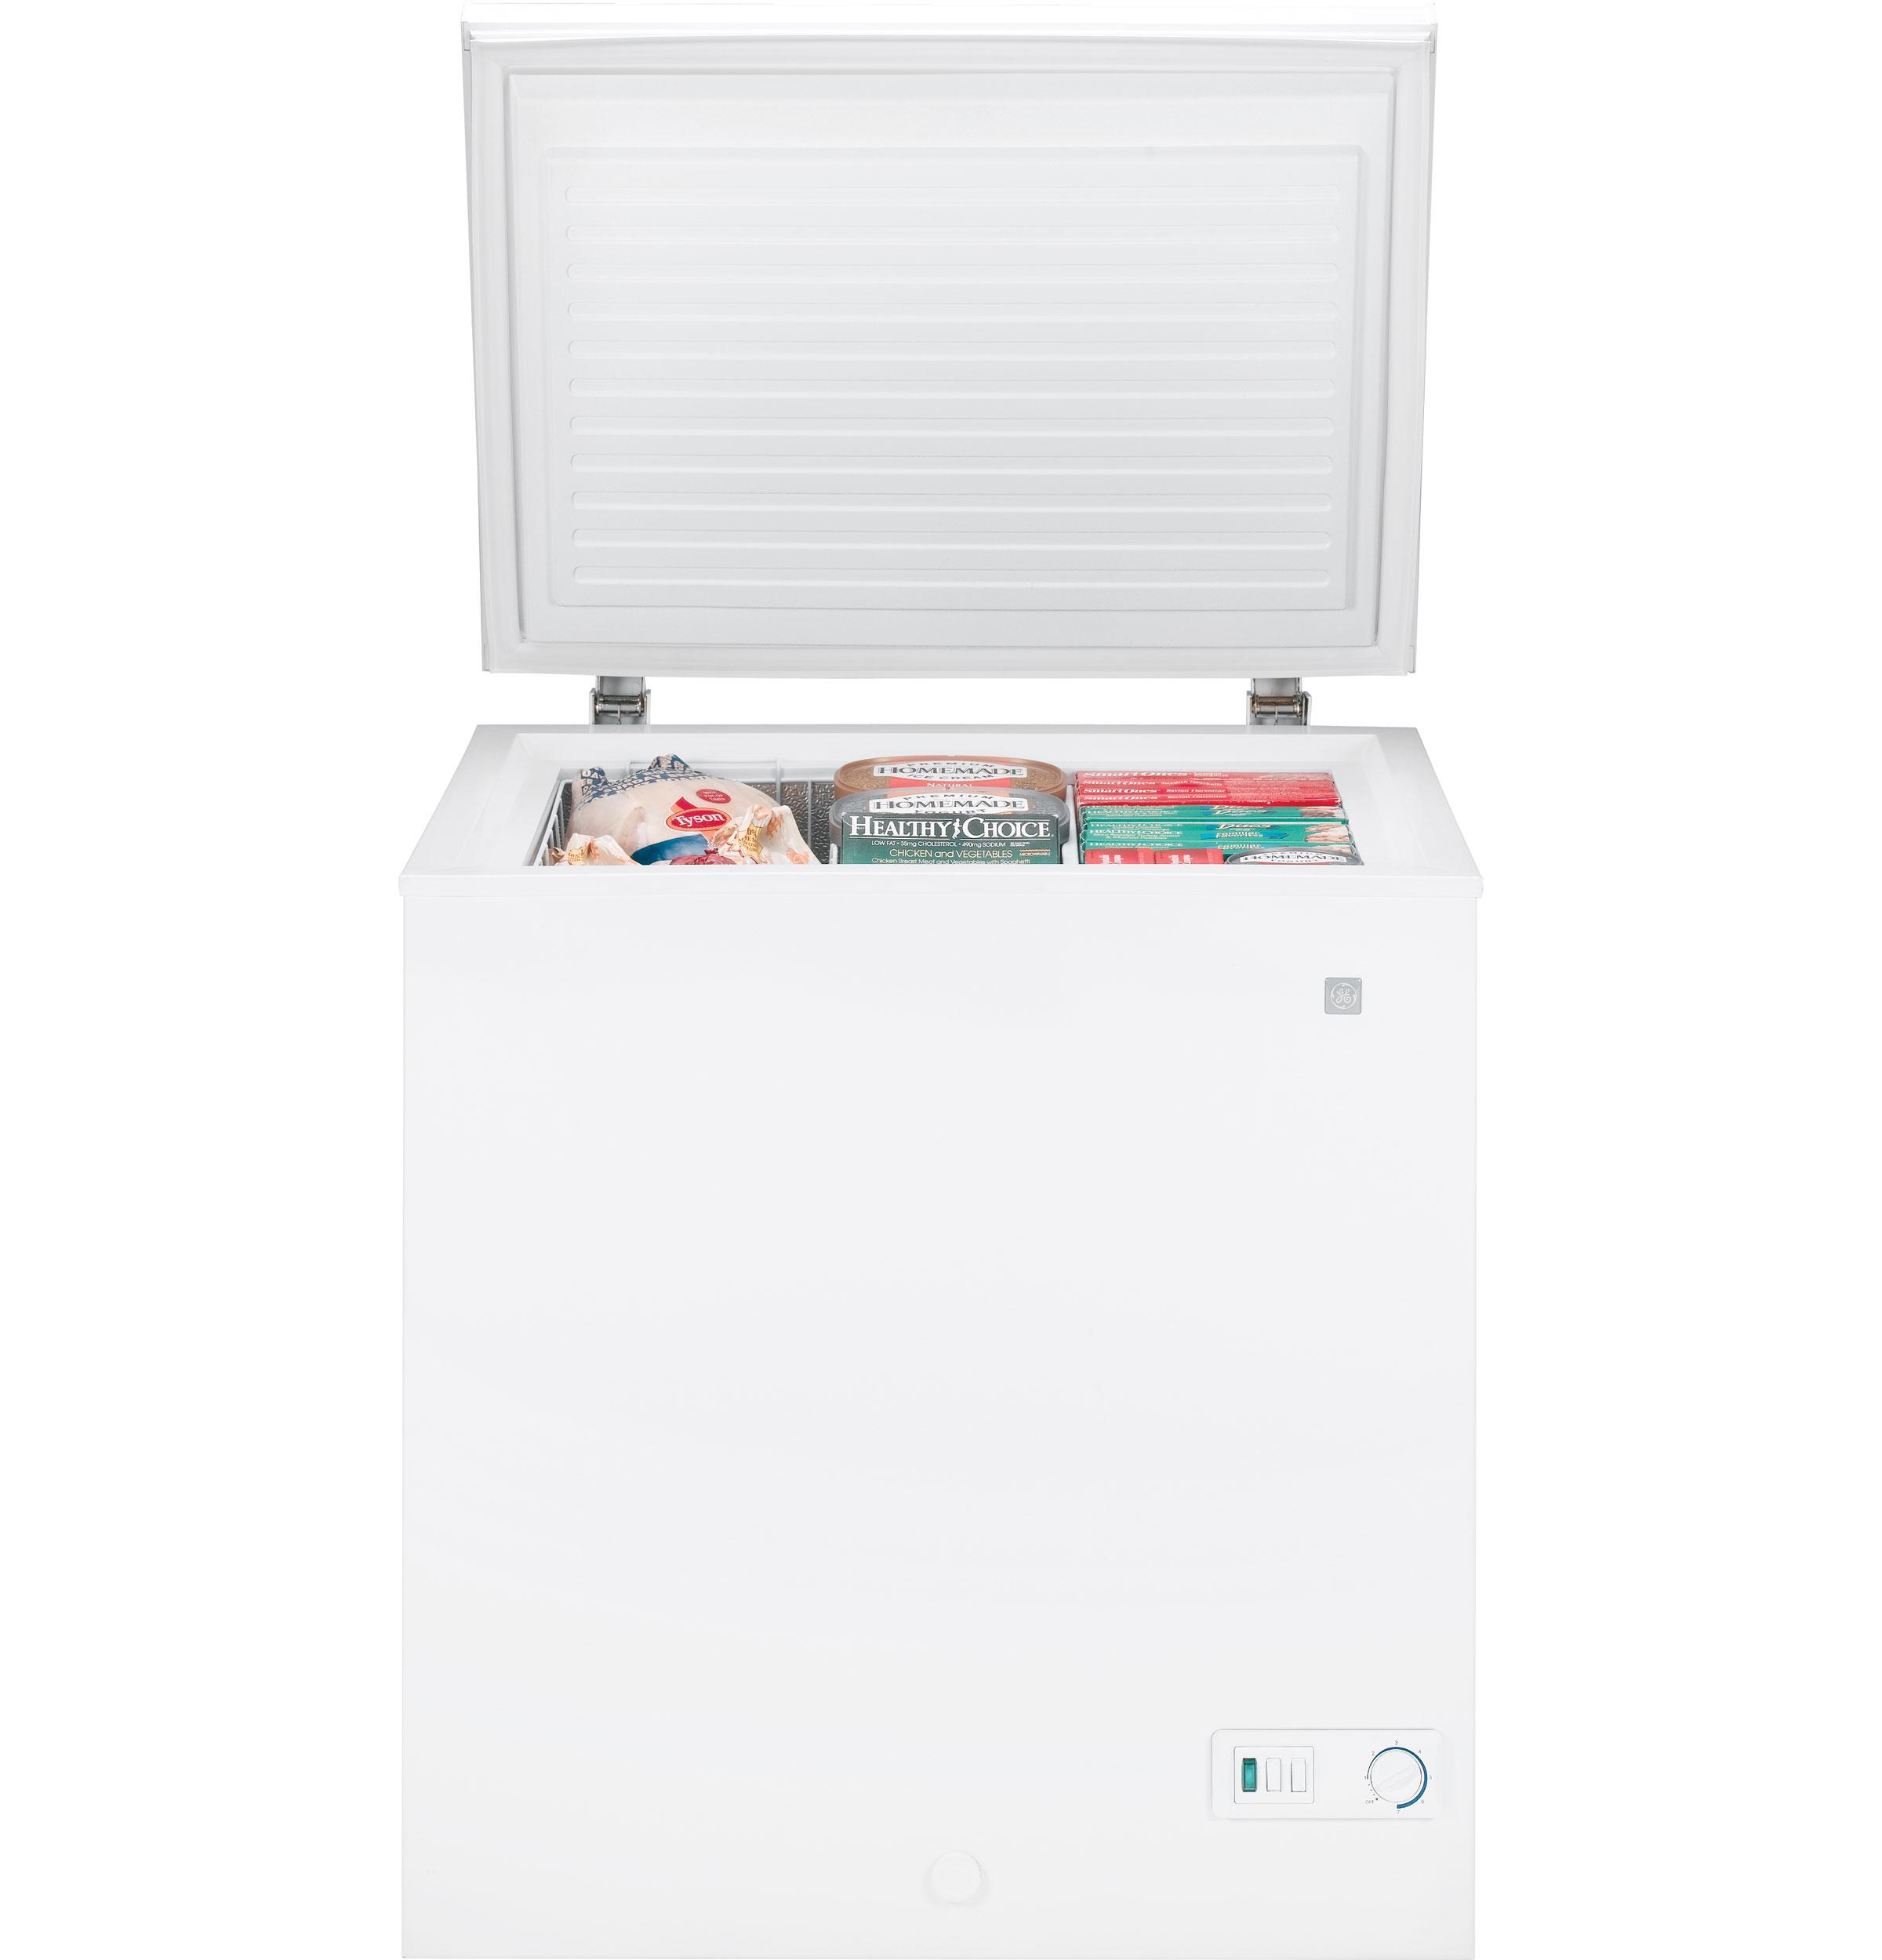 8.75 cubic foot freezer chest